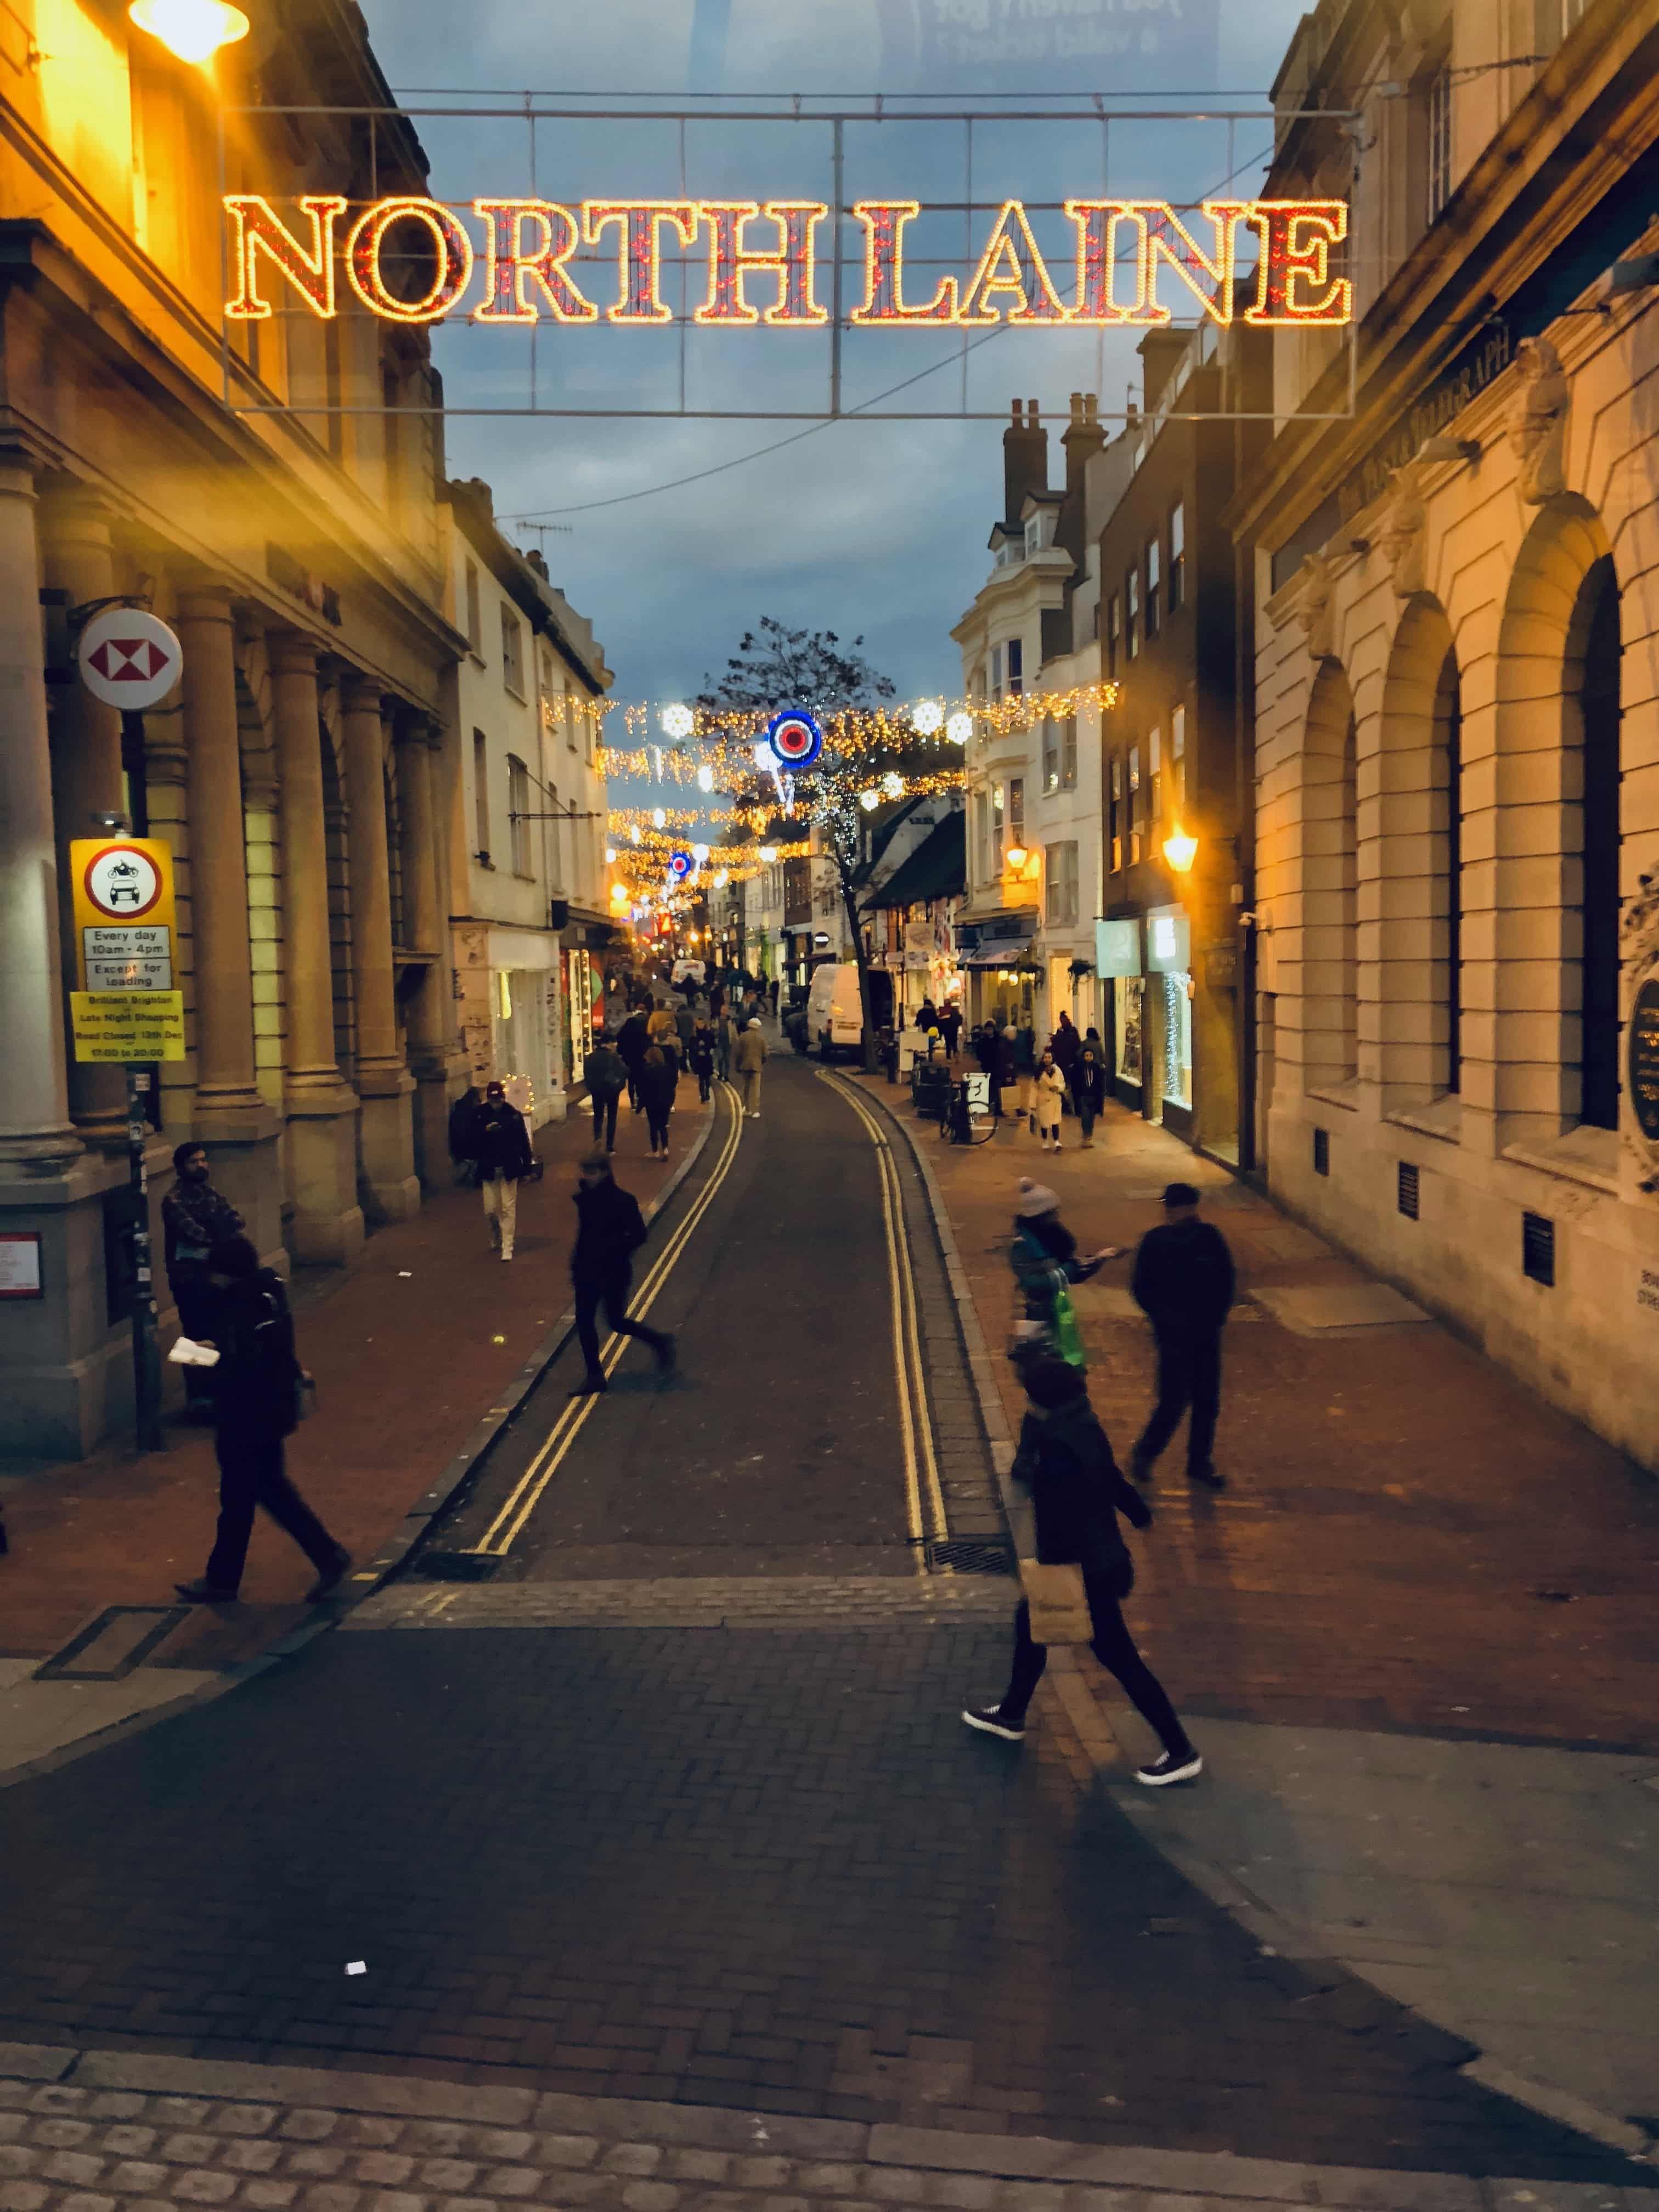 Image may contain: Walkway, Road, Pavement, Sidewalk, Asphalt, Tarmac, Footwear, Clothing, Shoe, Apparel, Path, Human, Person, Pedestrian